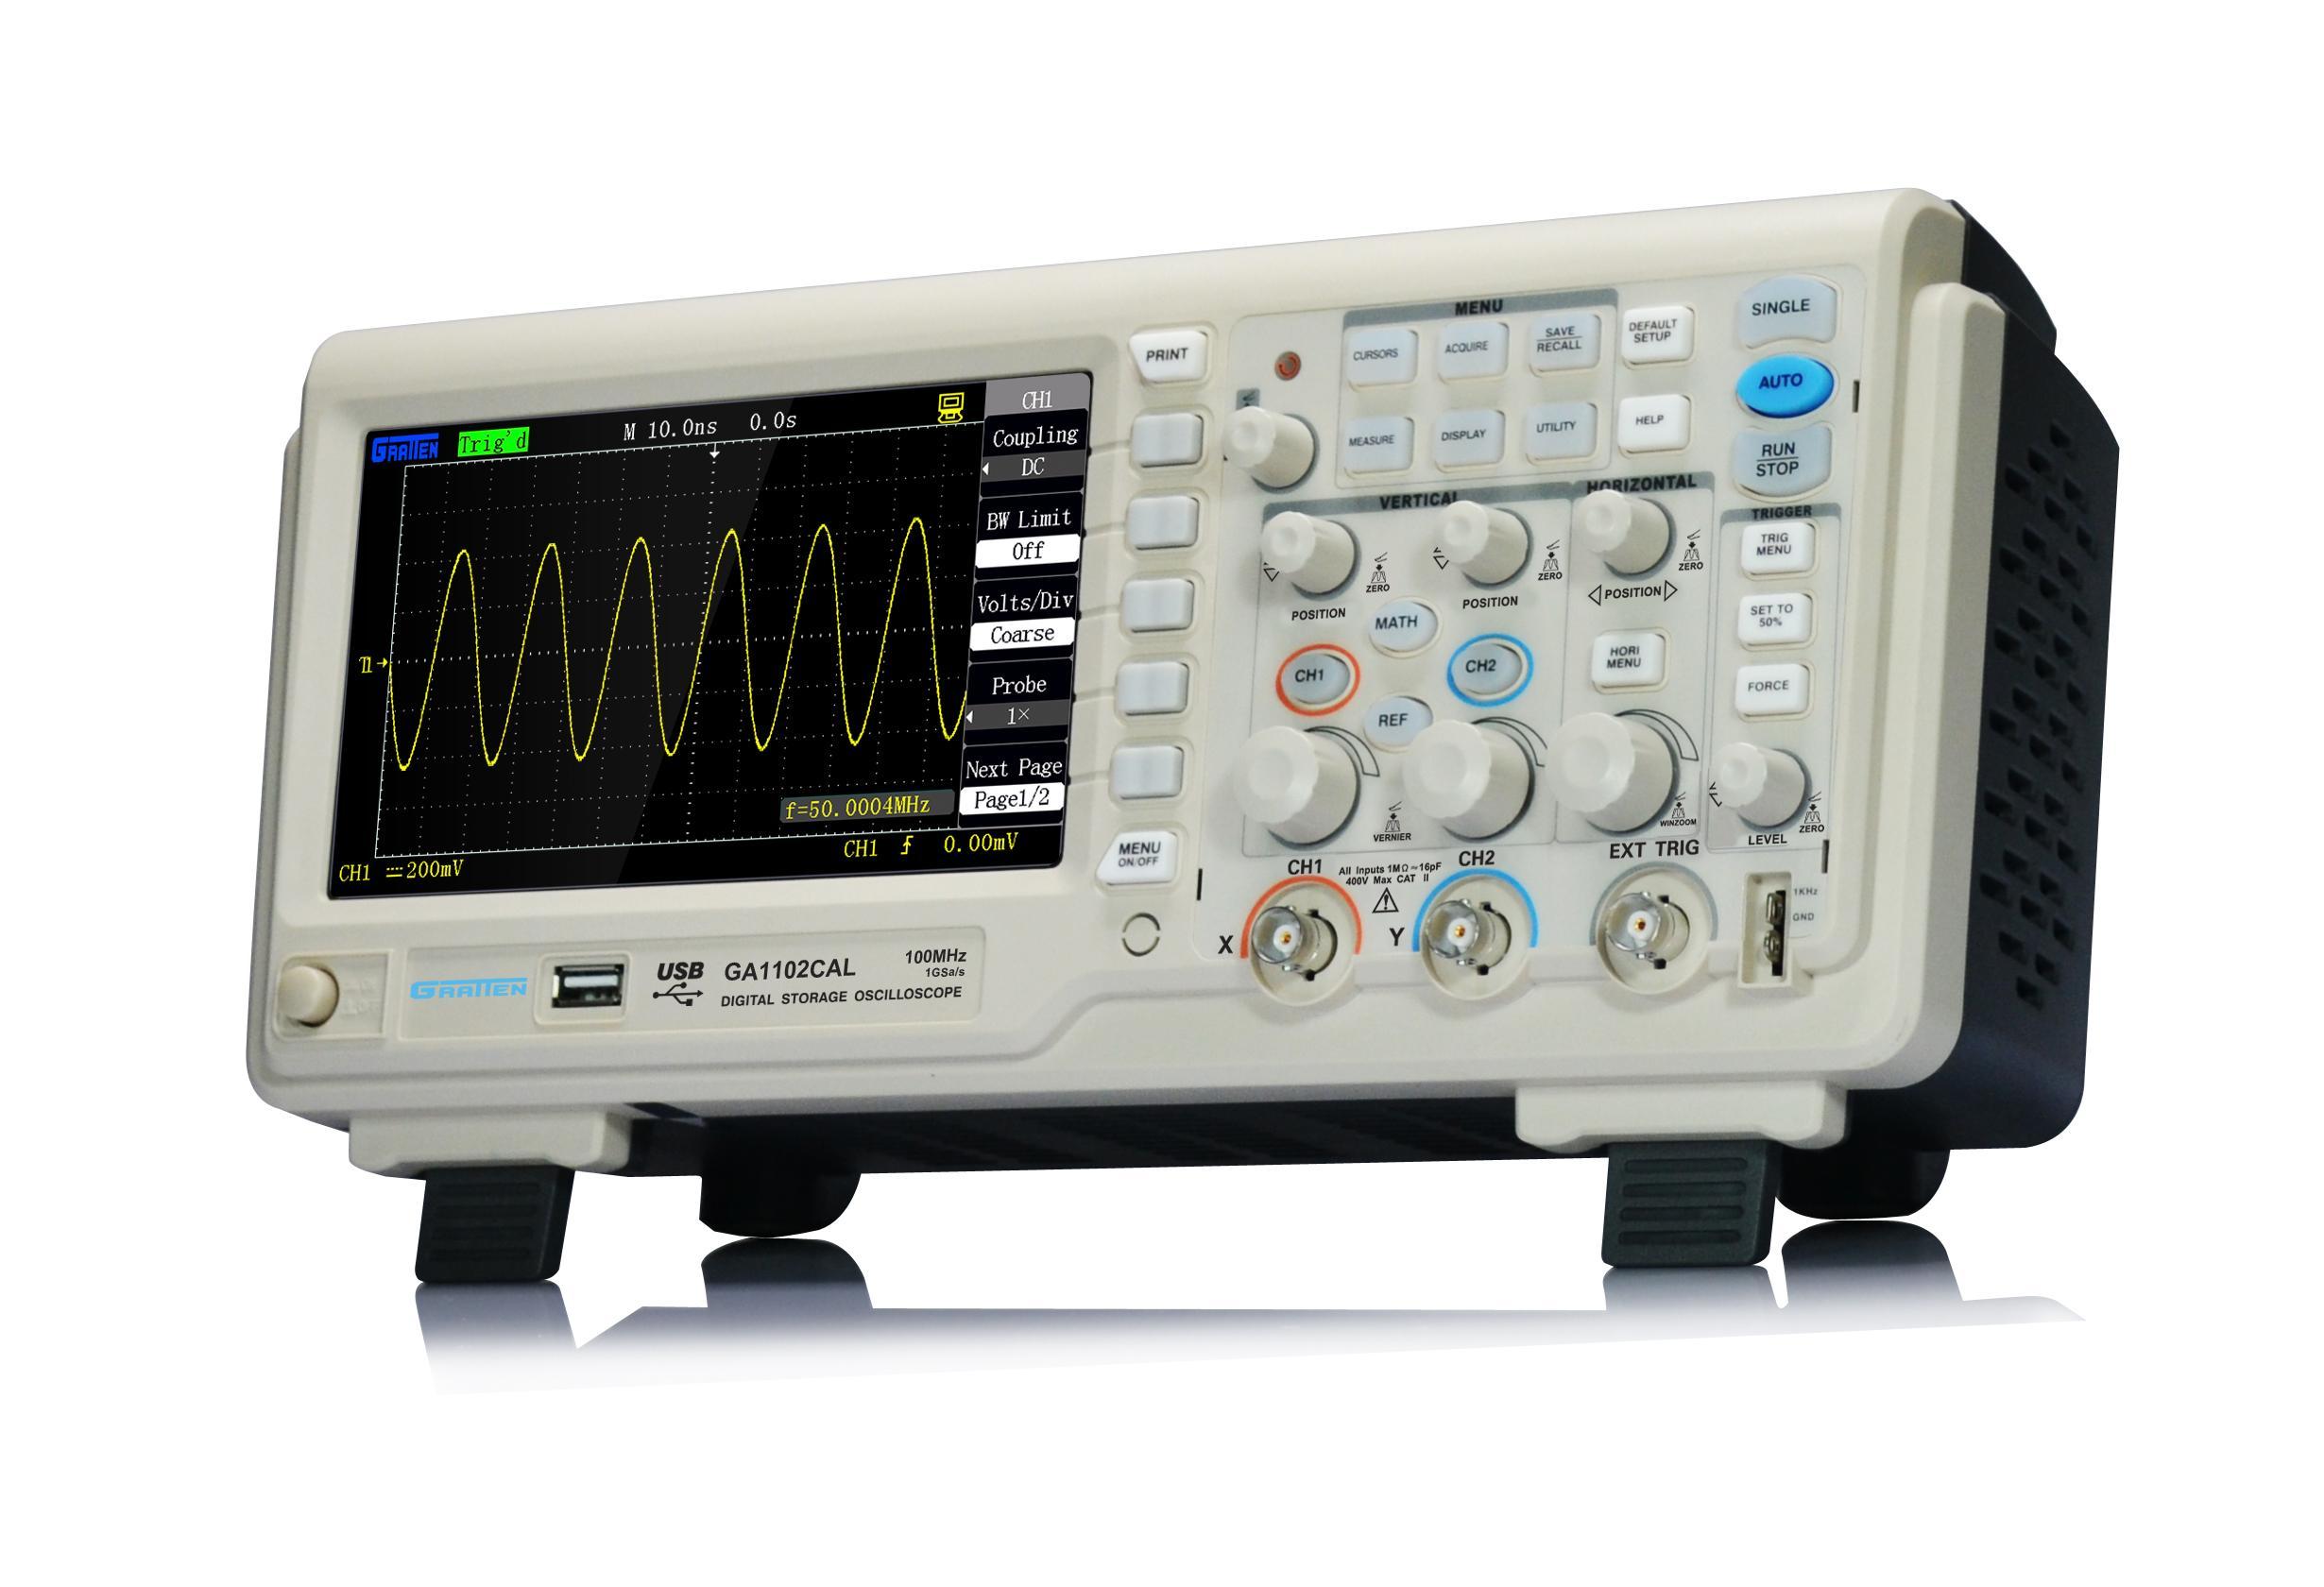 Digital Oscilloscope Software : Digital storage oscilloscope gratten ga cal mhz